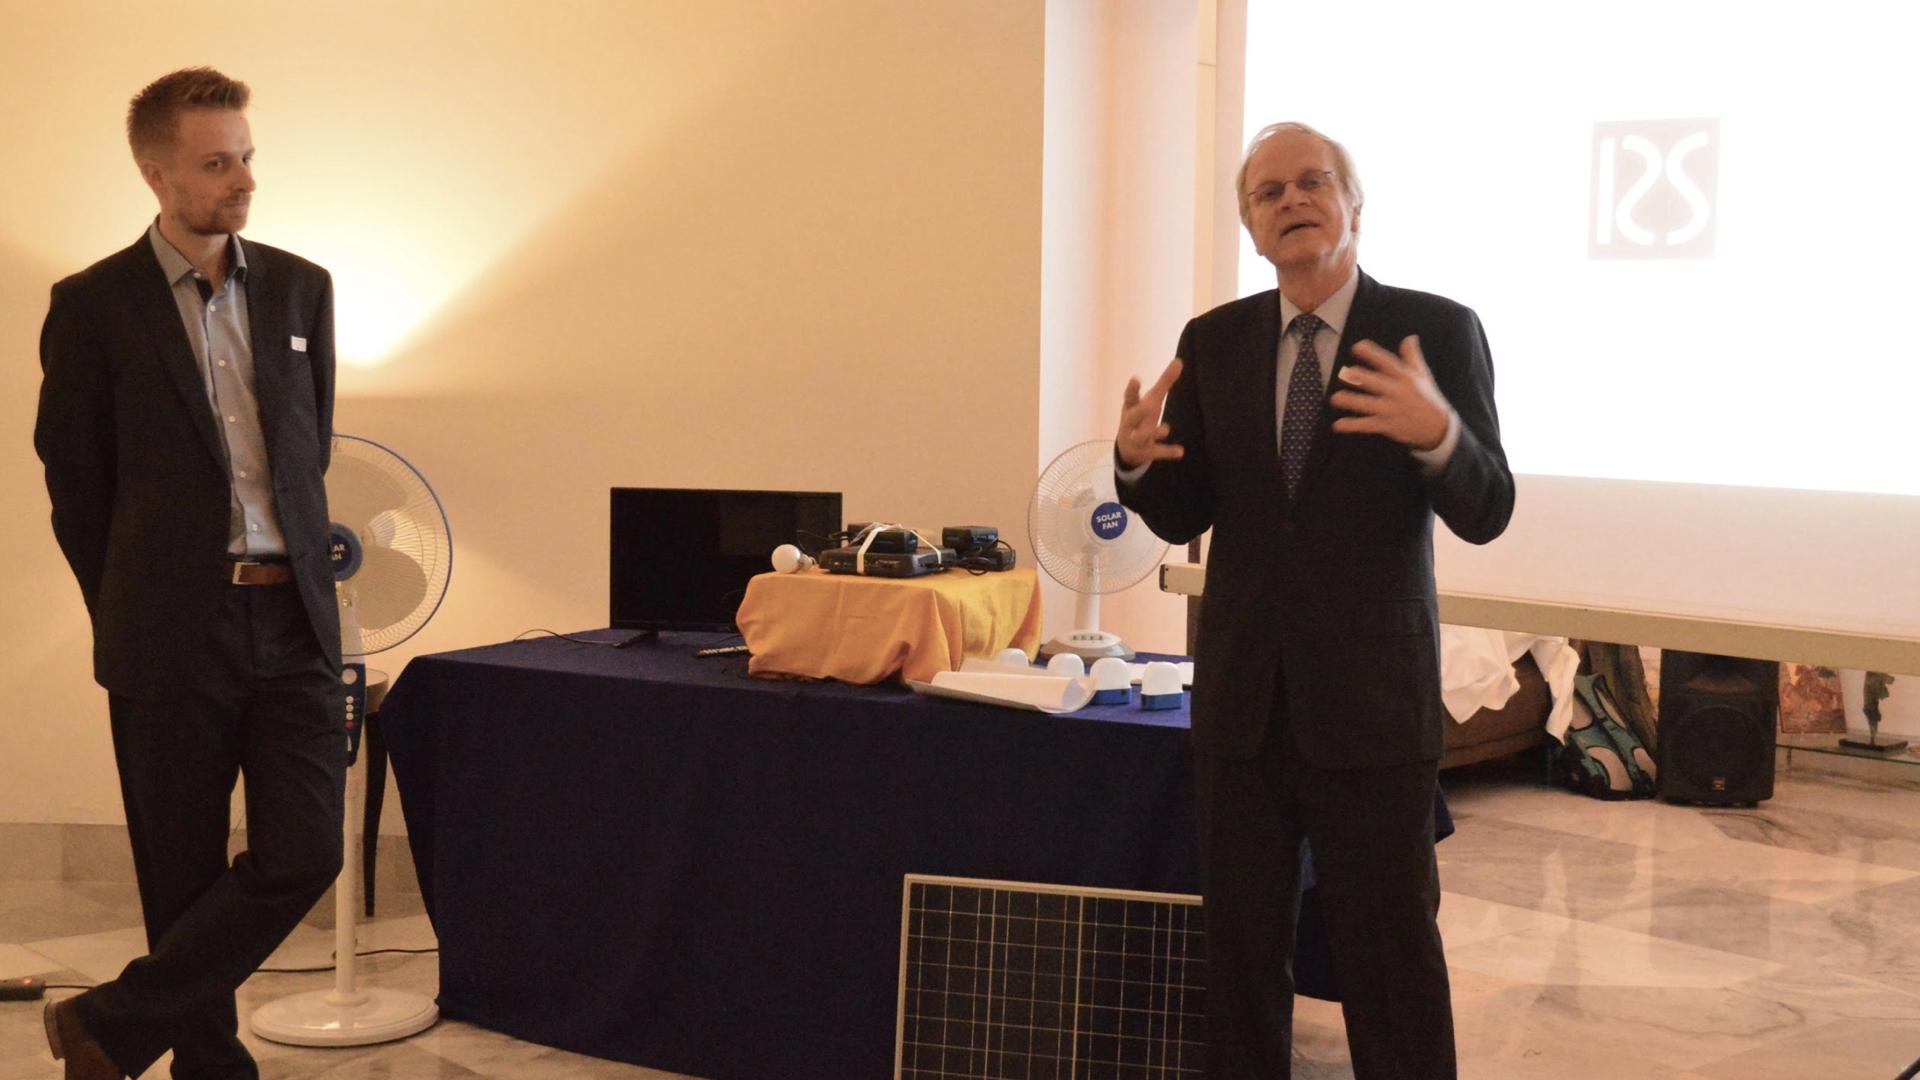 Dutch Ambassador Alphonso Stoelinga opening the event.